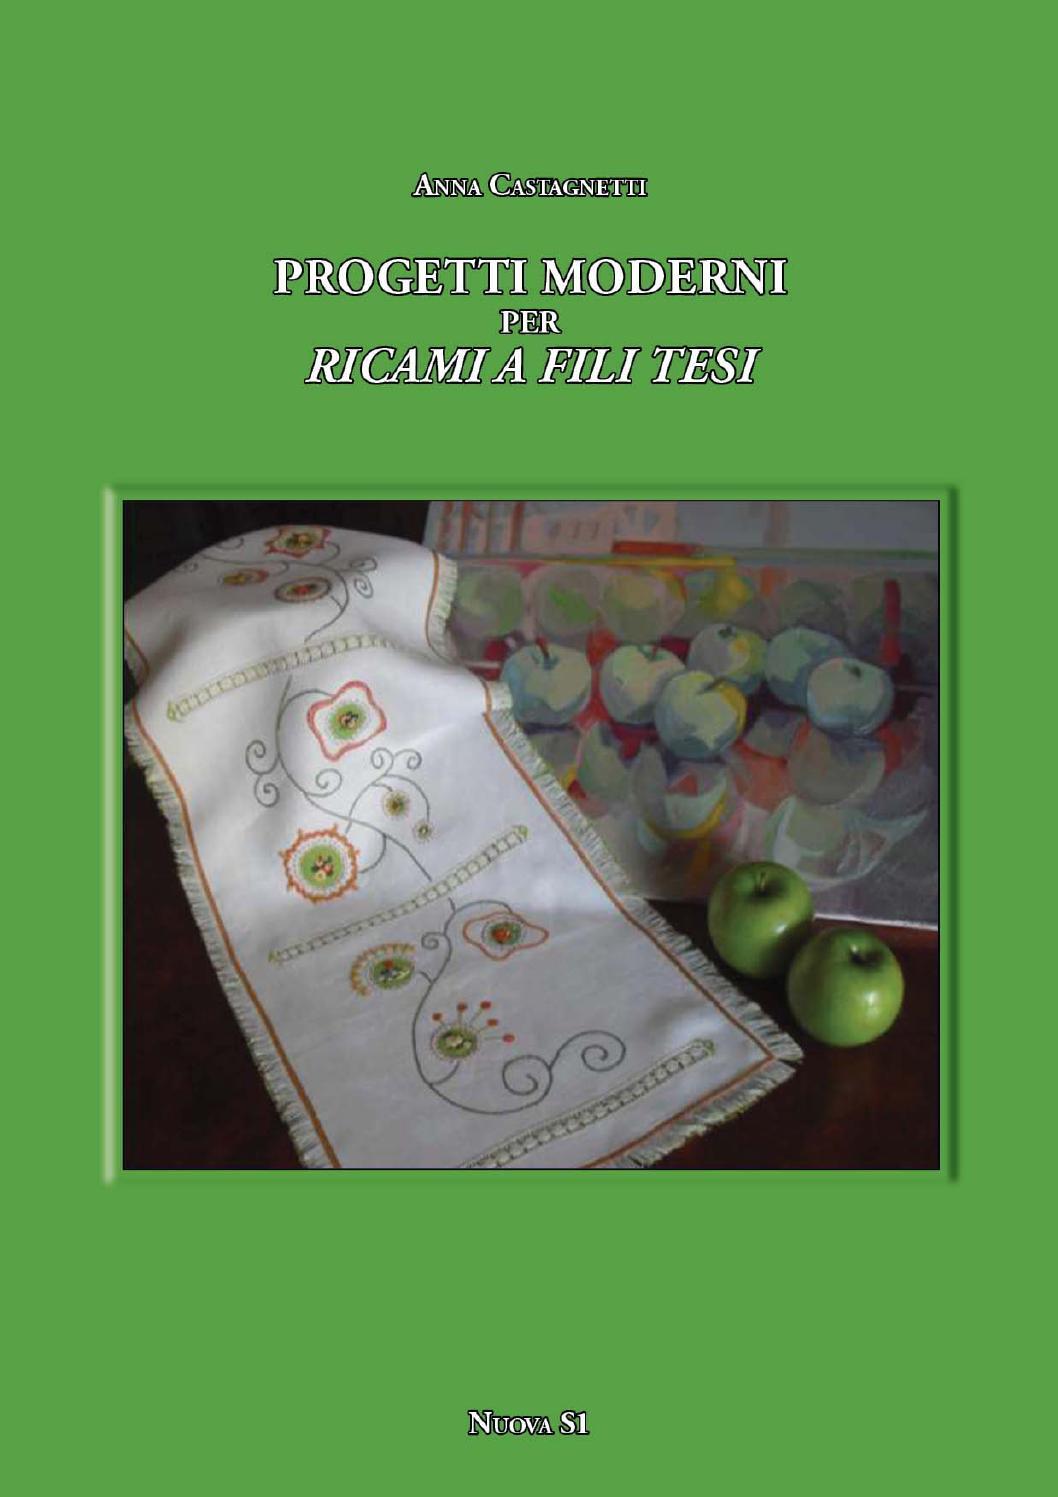 Anna castagnetti progetti moderni per ricami a fili tesi for Progetti moderni